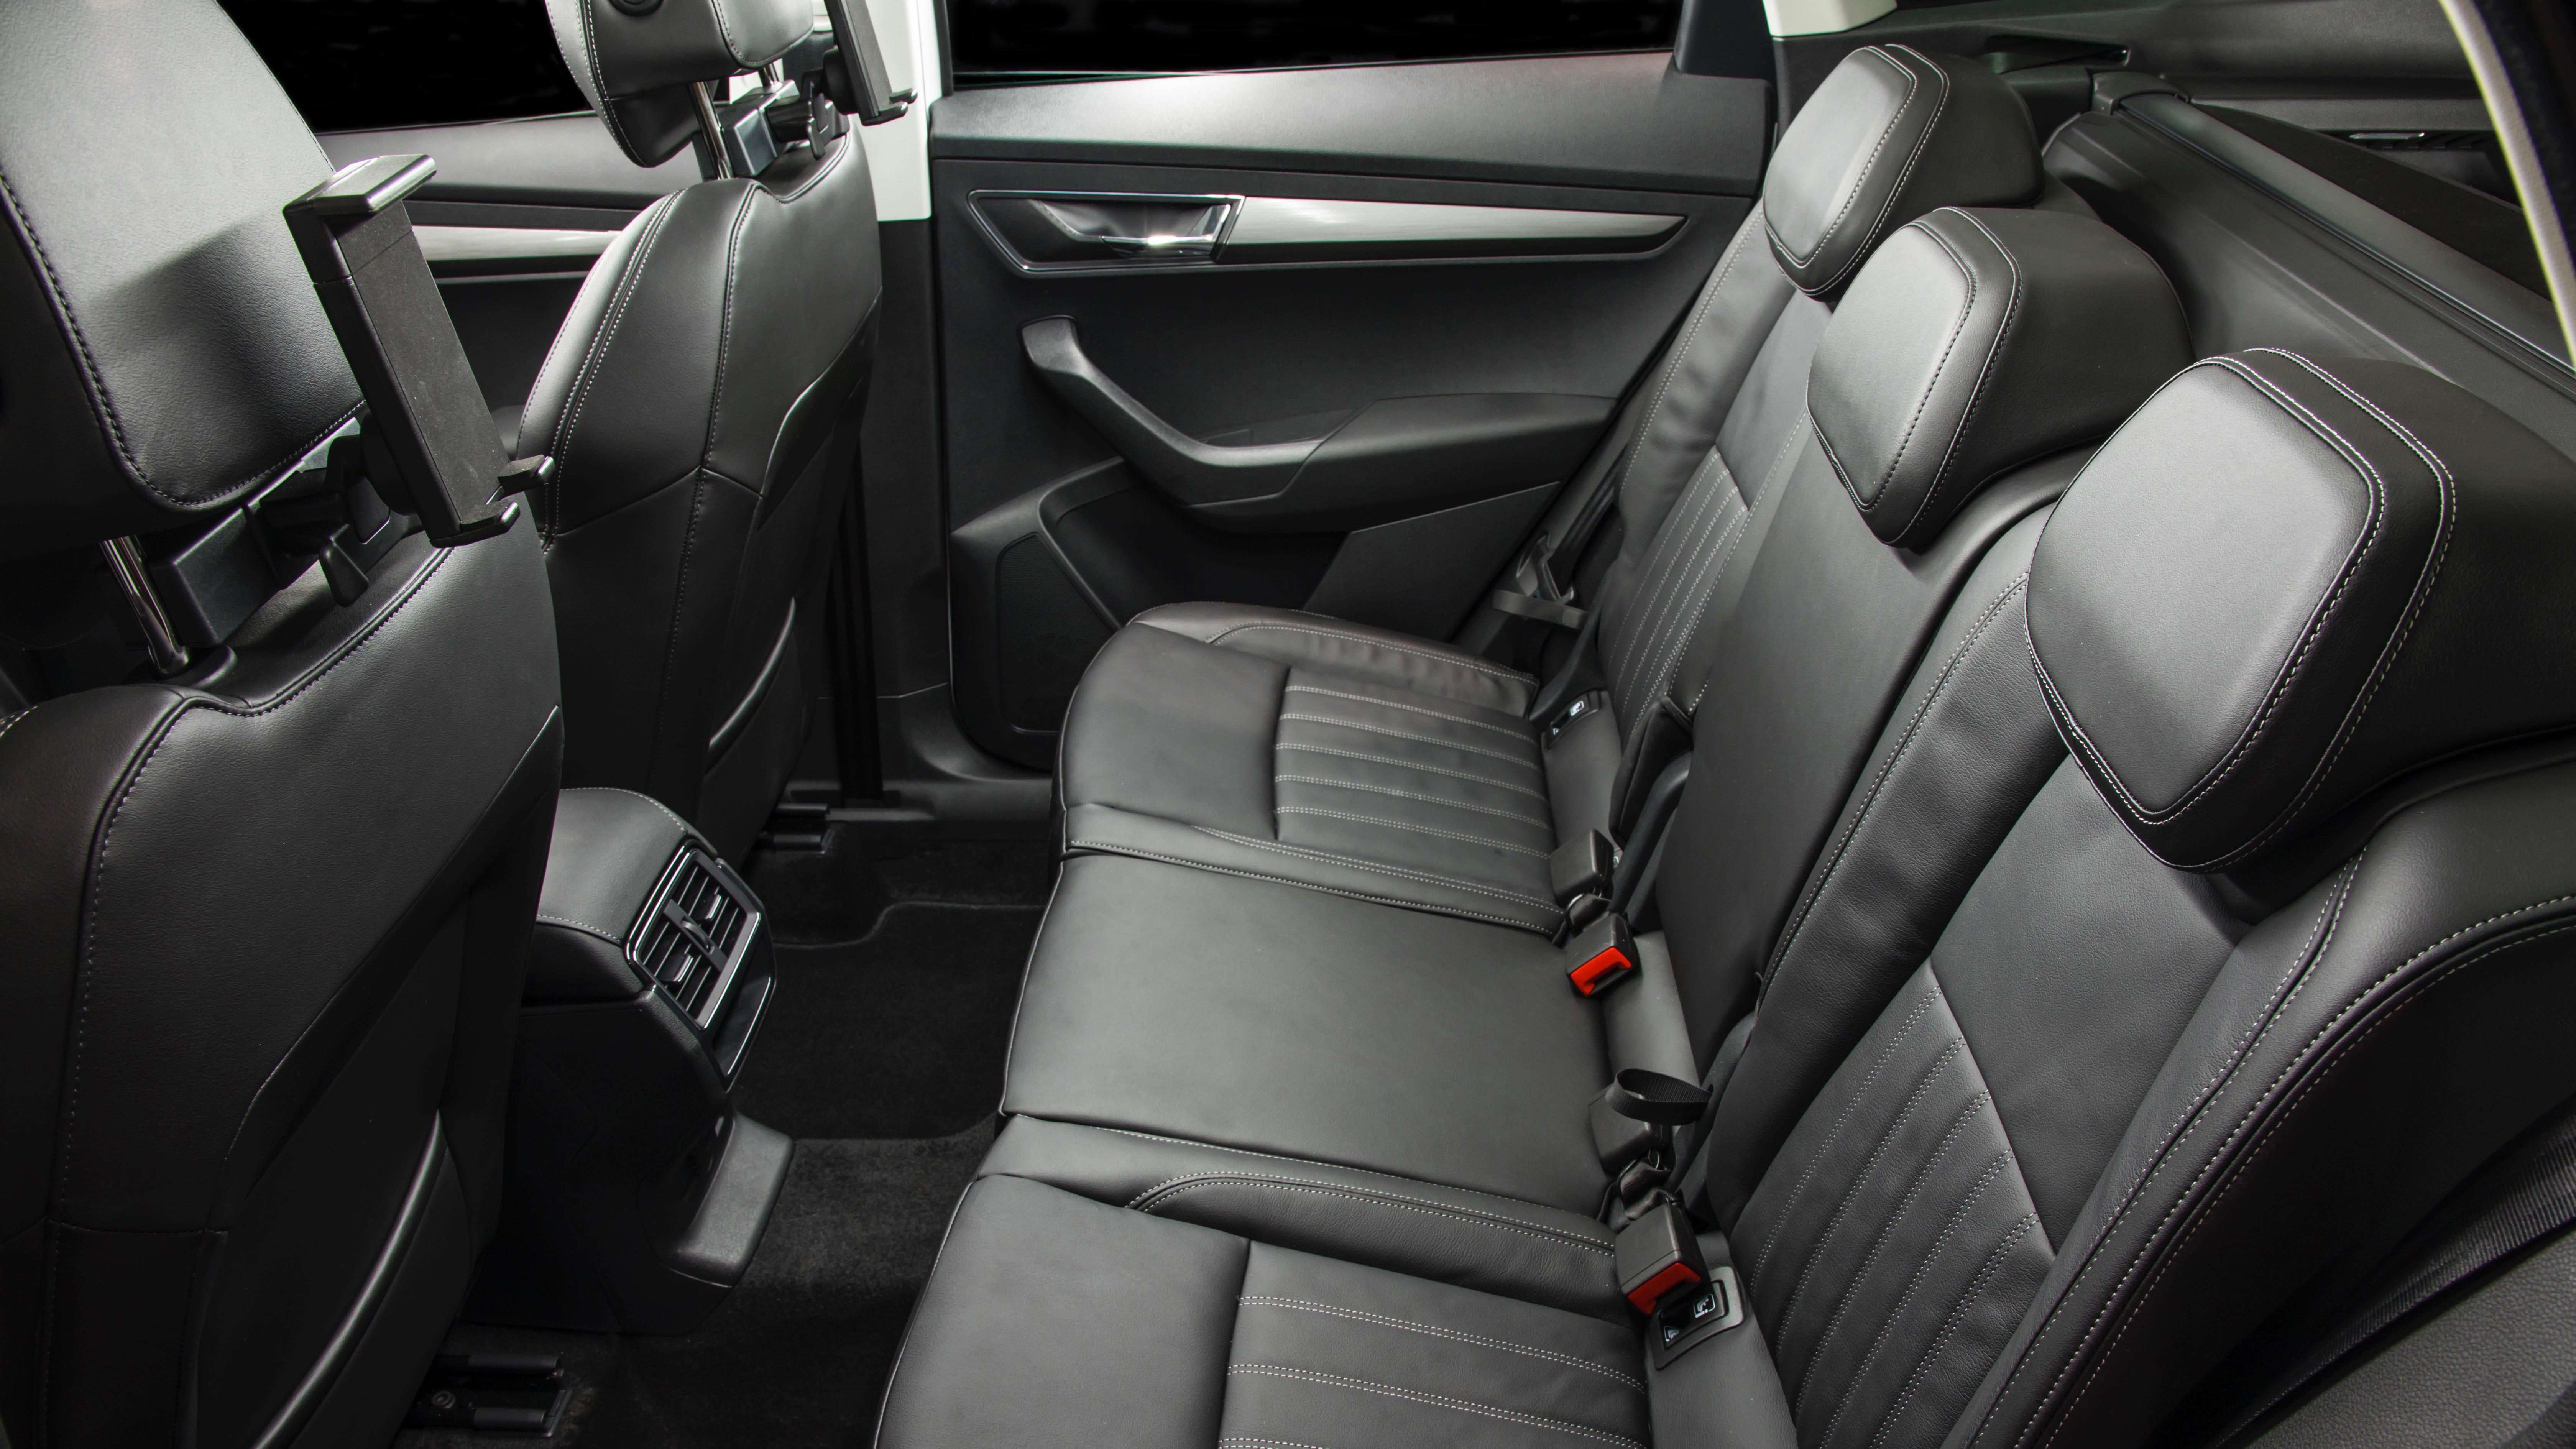 2018 Skoda Karoq rear seat upright